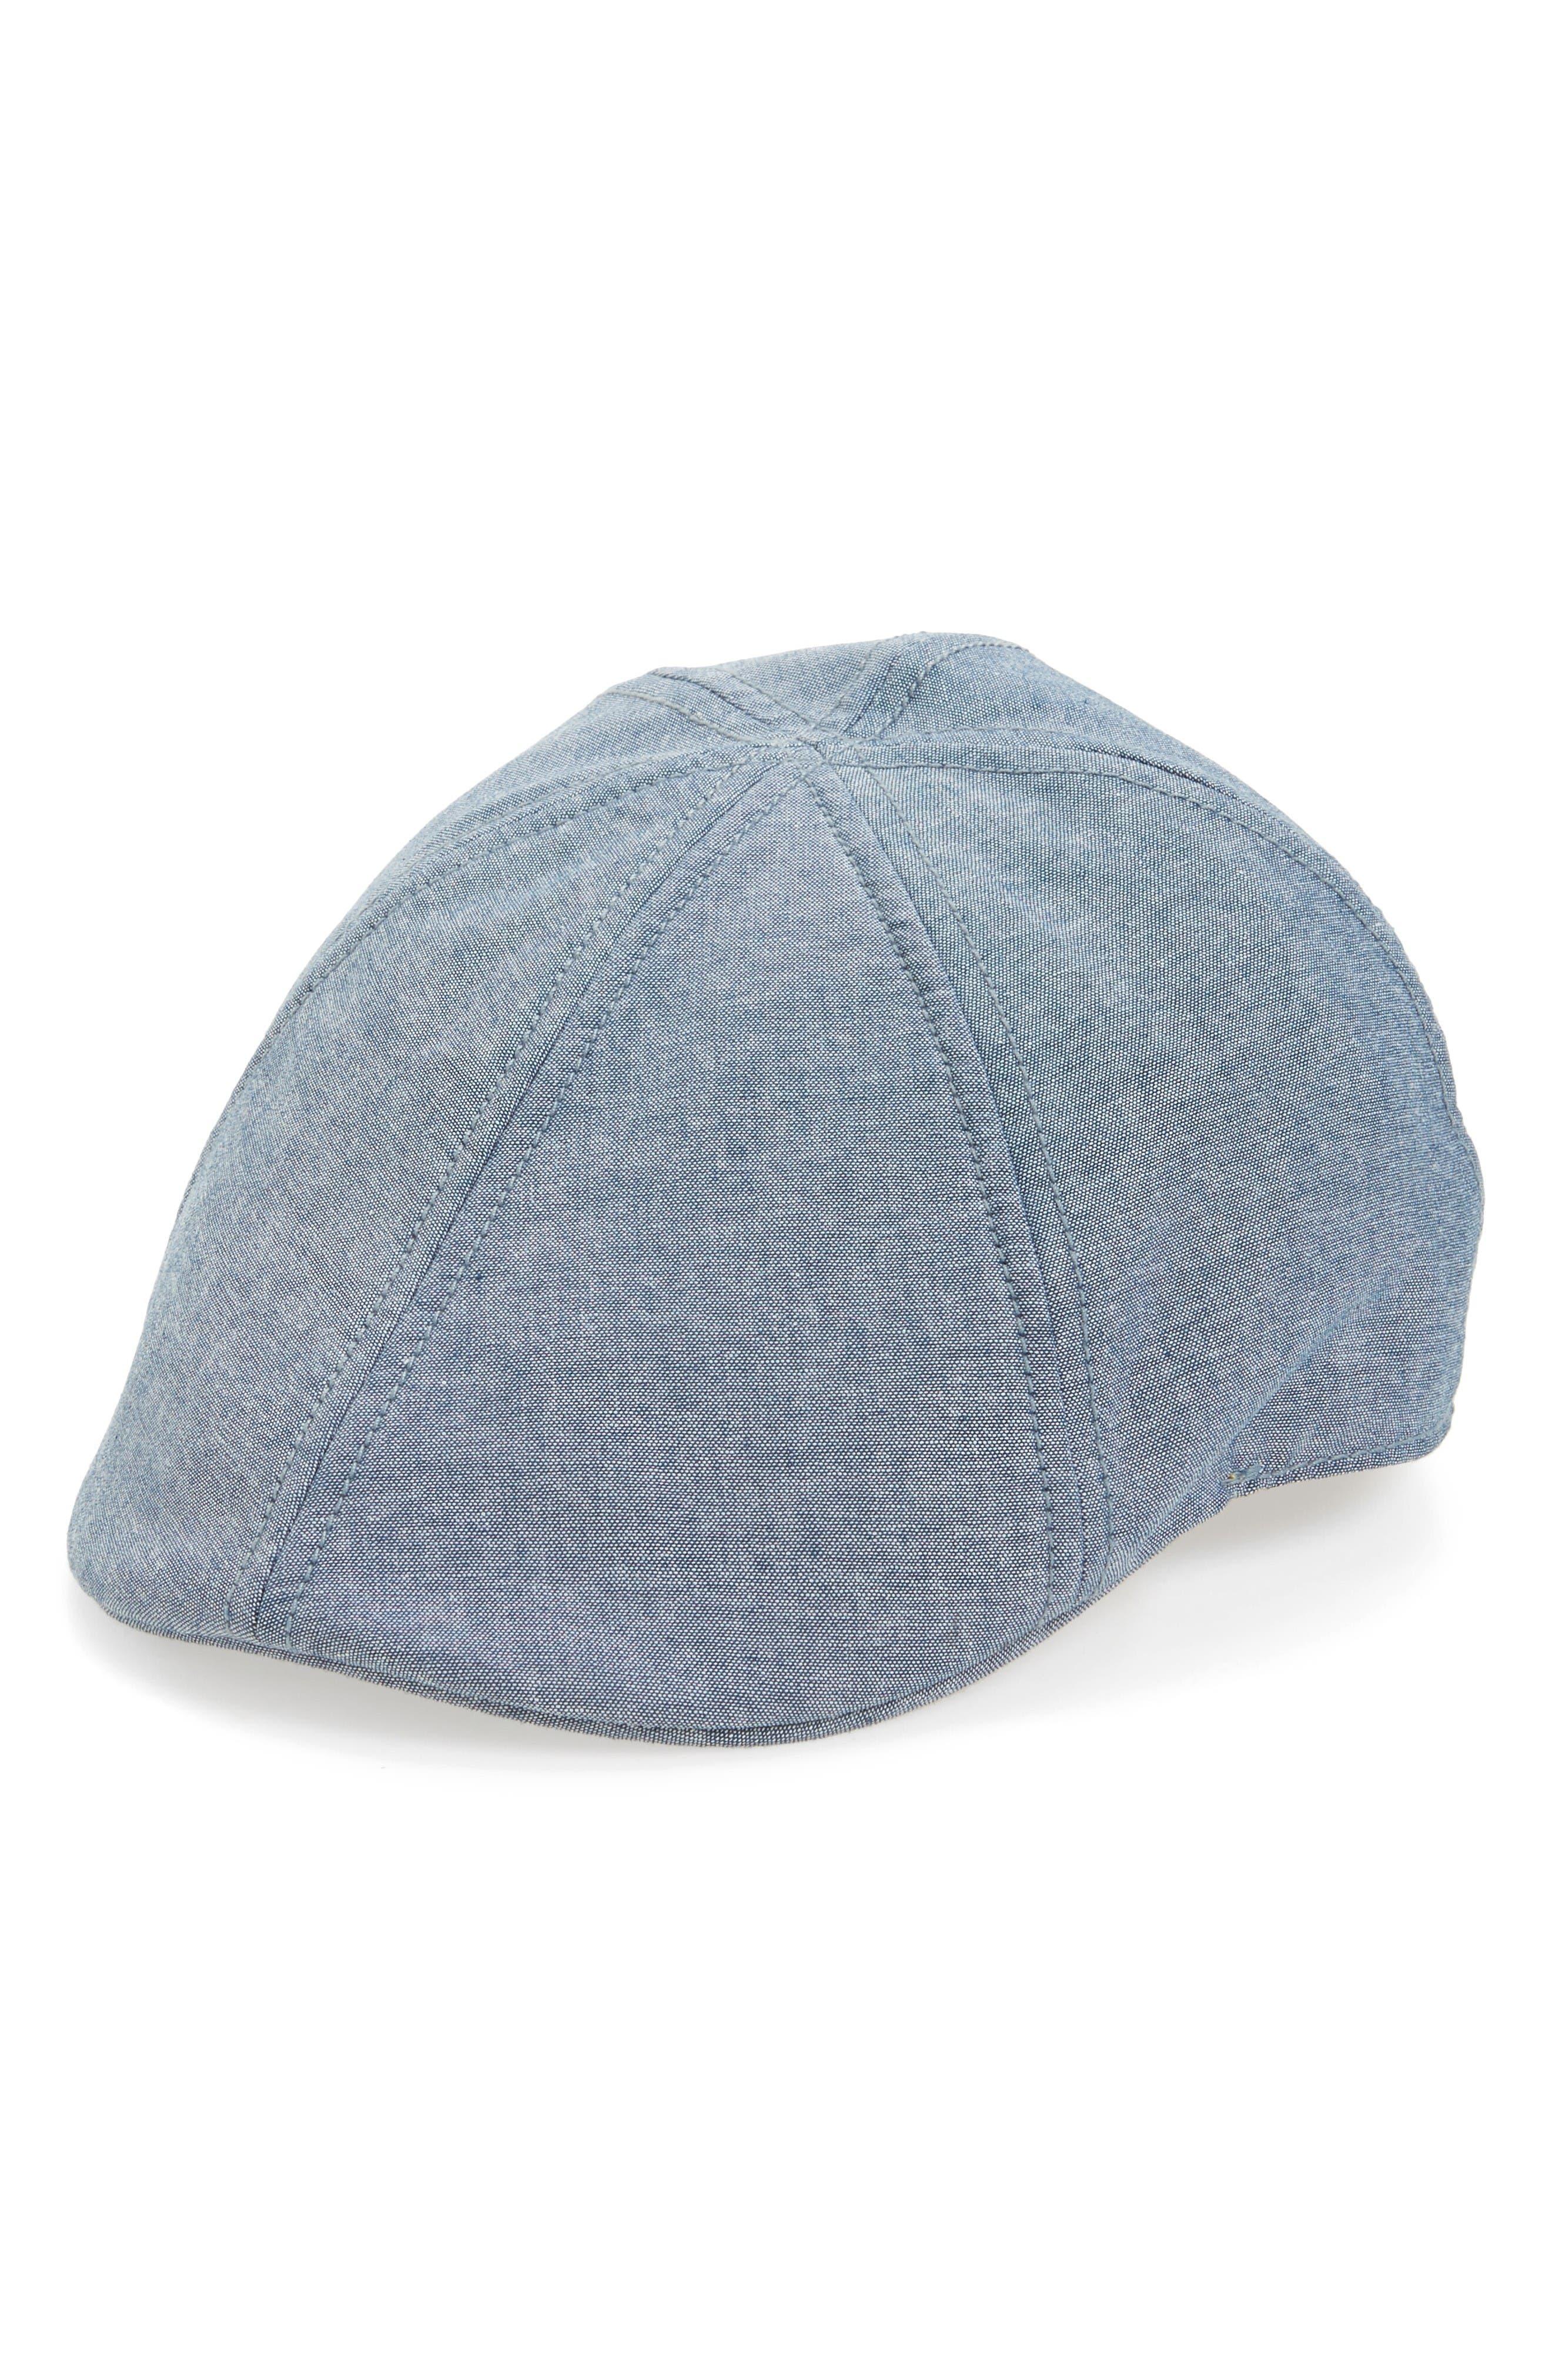 Goorin Brothers Mr. Bang Driver's Hat